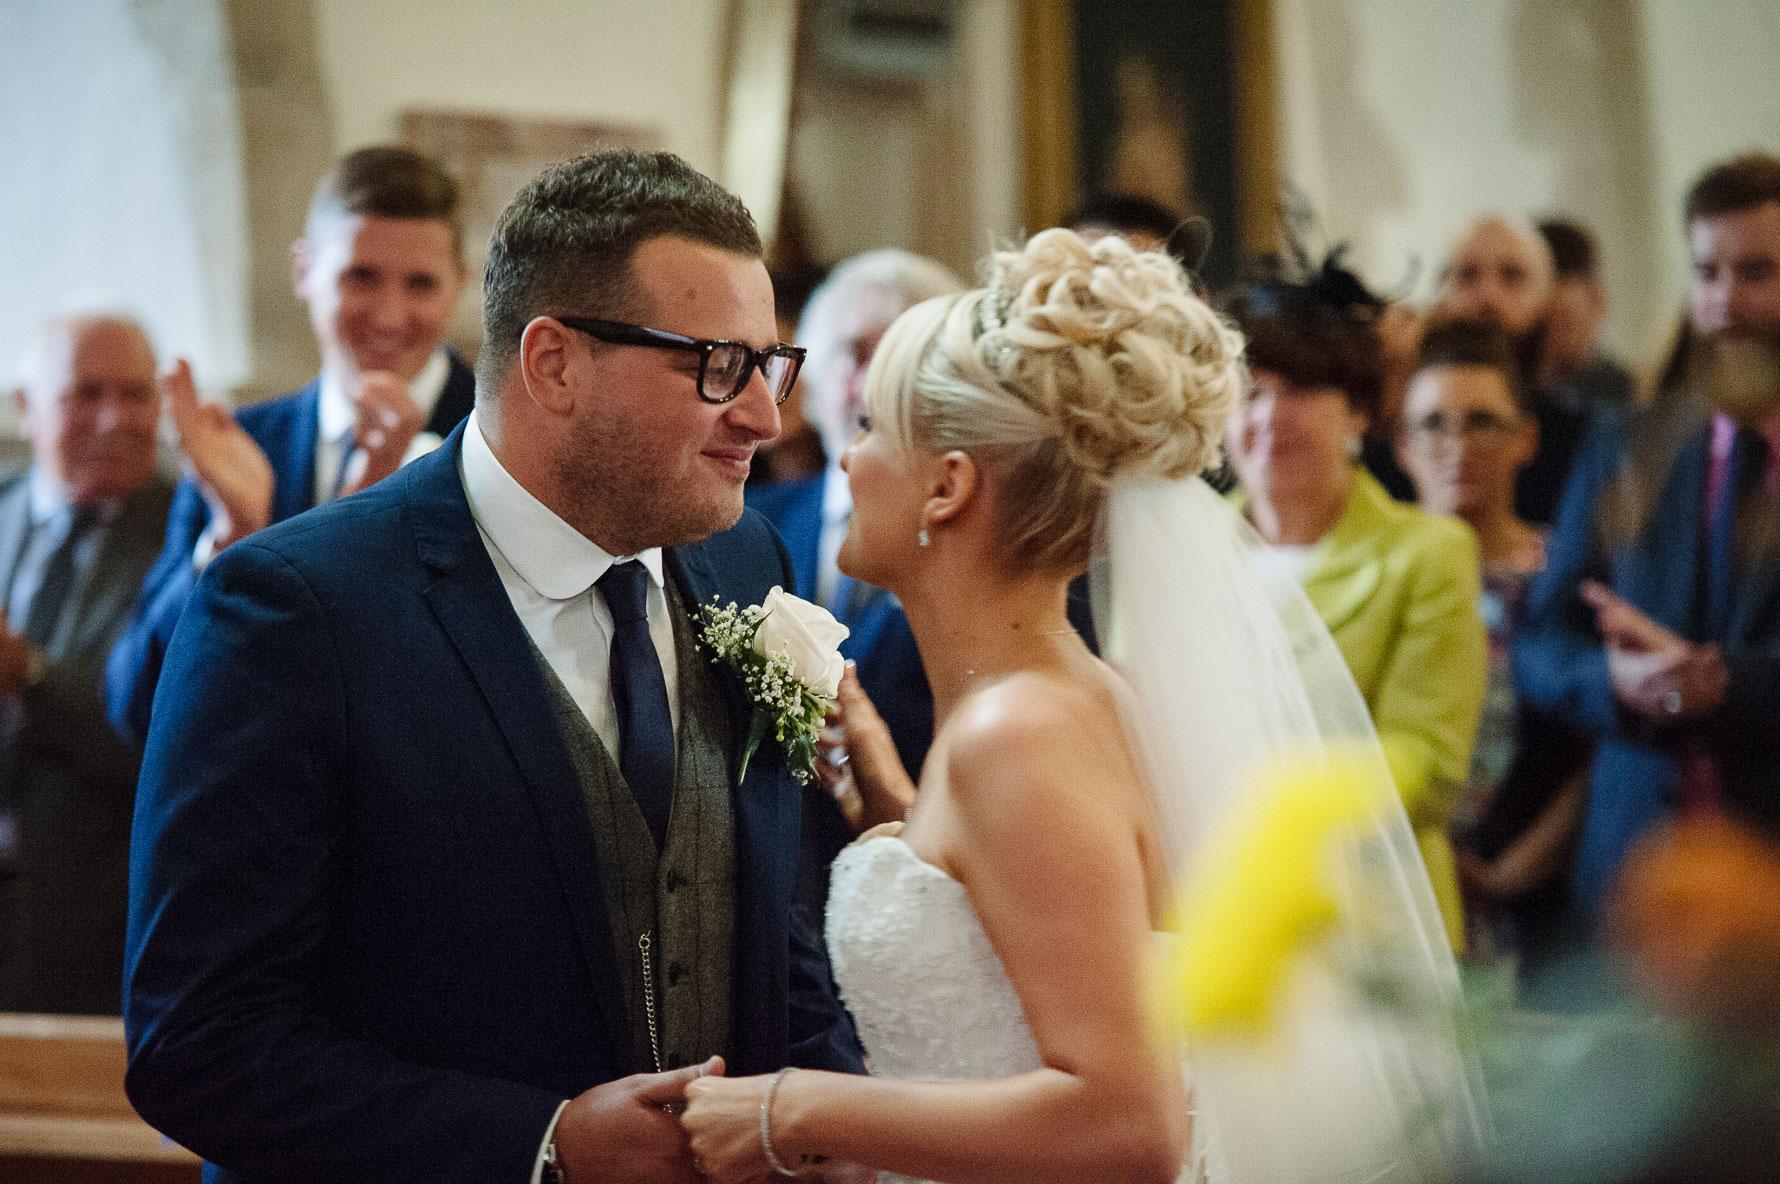 Canterbury Cathedral Lodge Wedding28-20141004 0469